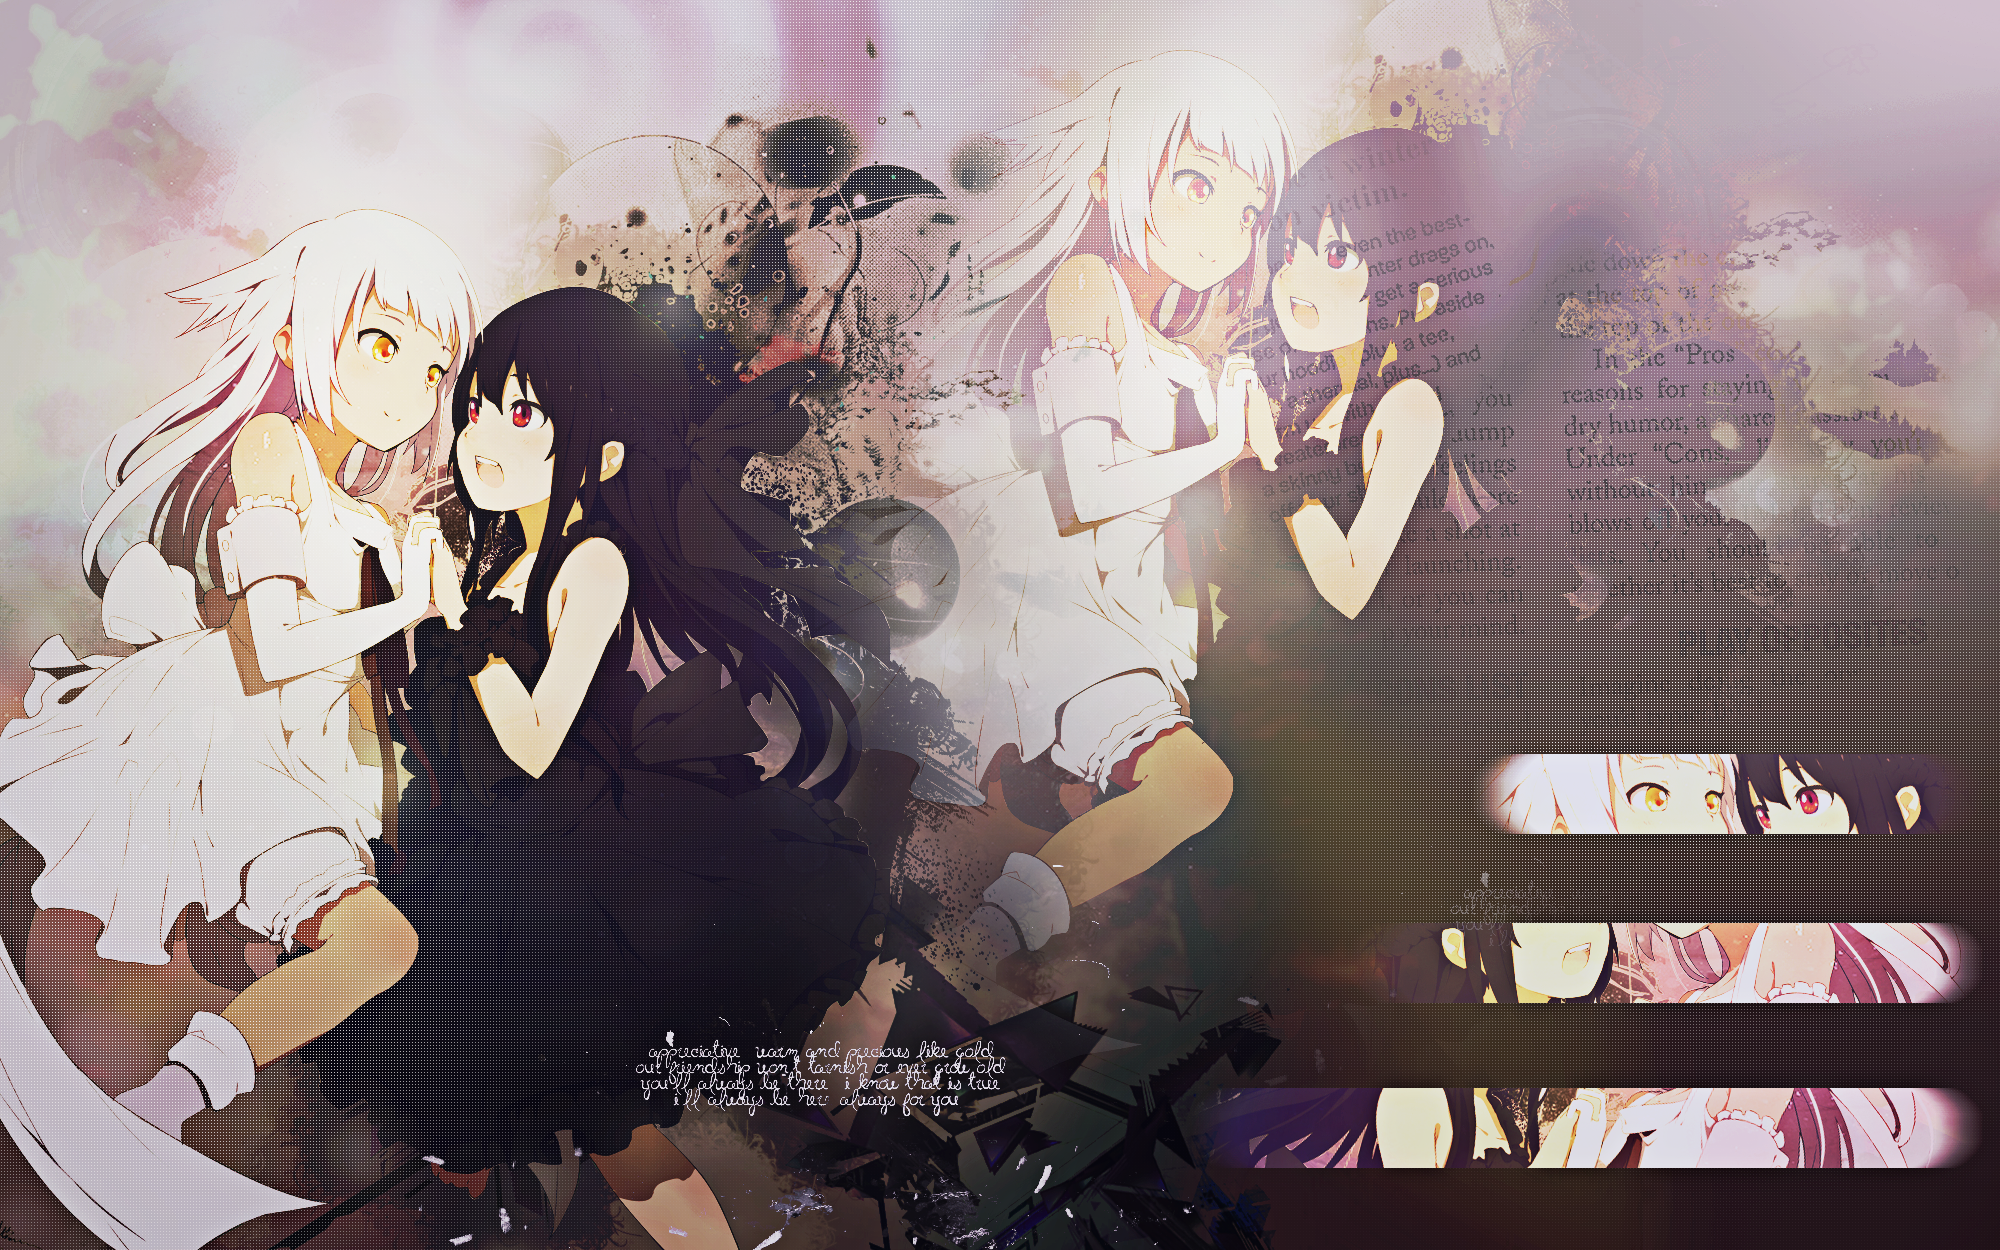 Wallpaper Anime Girls Black Buraku by Nagamii Chan 2000x1250